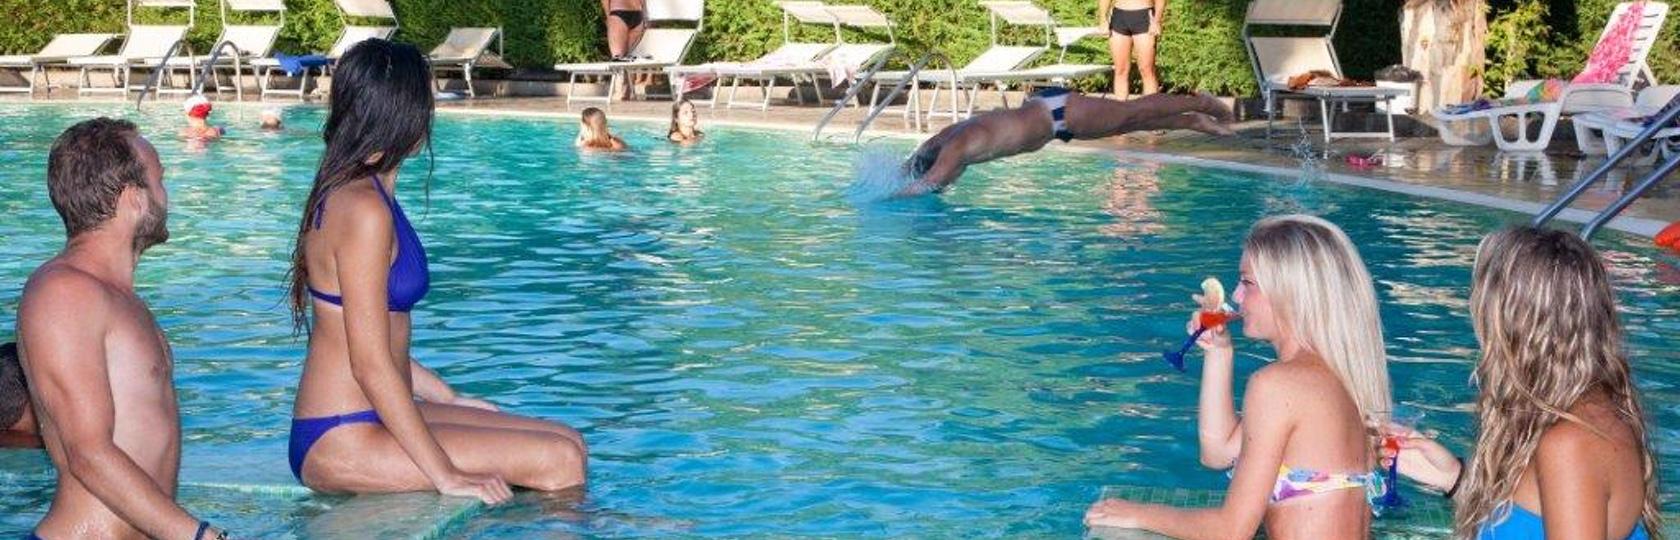 holidaybeach_piscina.jpg